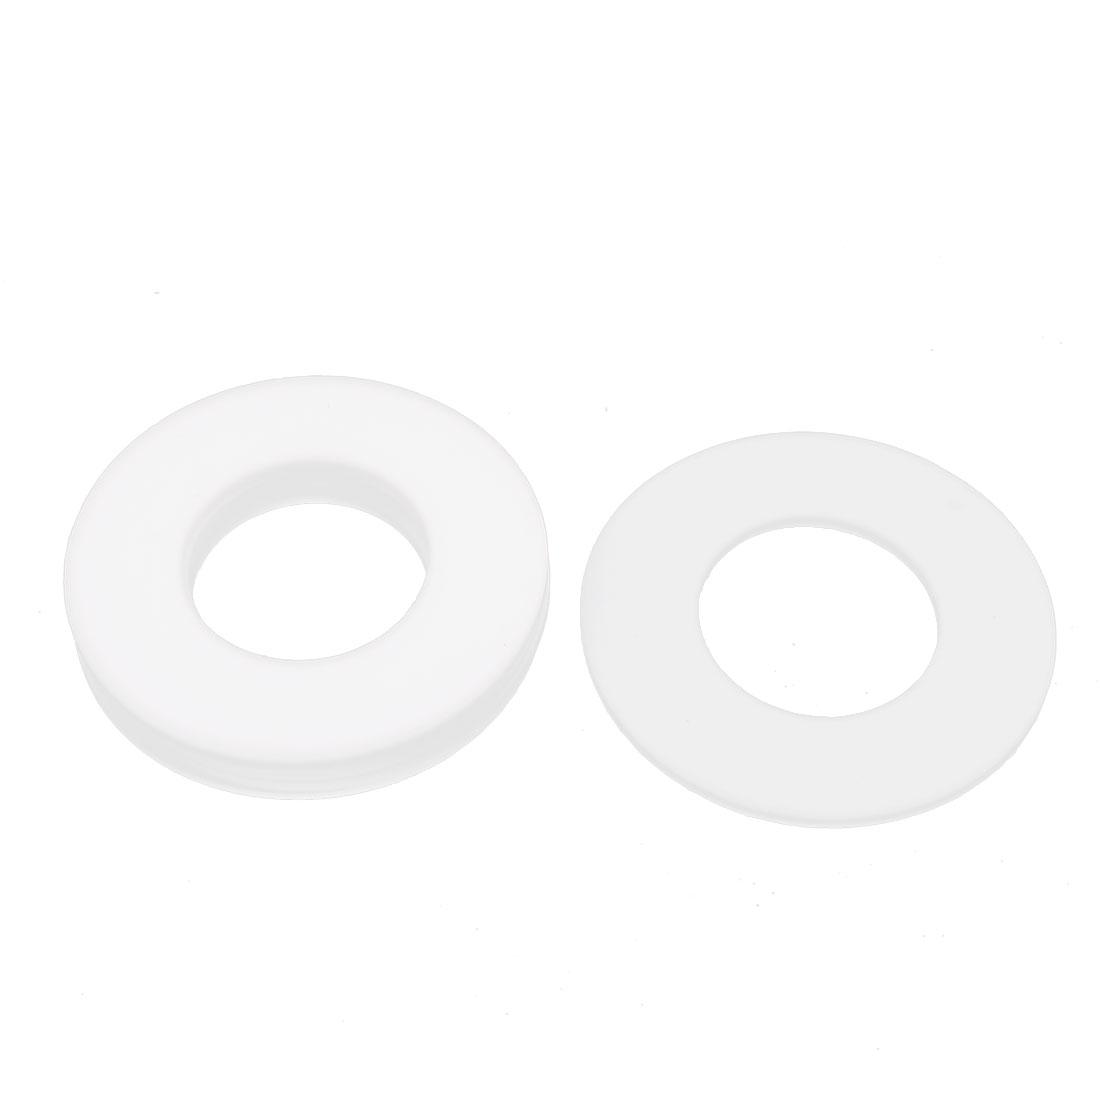 5 Pcs DN40 88 x 45 x 3mm PTFE Flange Gasket Sanitary Pipe Fitting Ferrules White